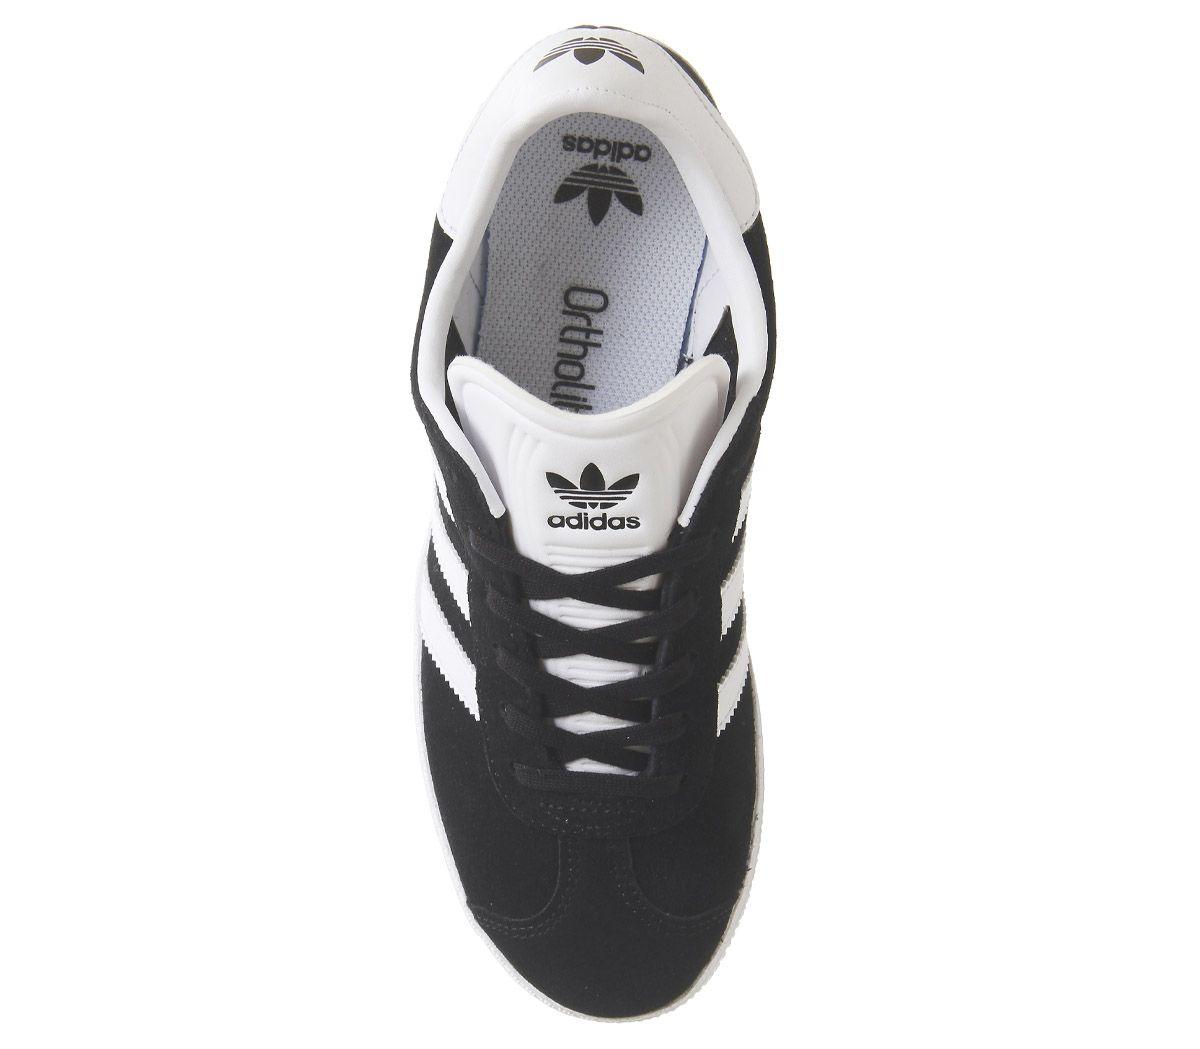 Womens-Adidas-Gazelle-Jnr-Trainers-Core-Black-Trainers-Shoes thumbnail 10